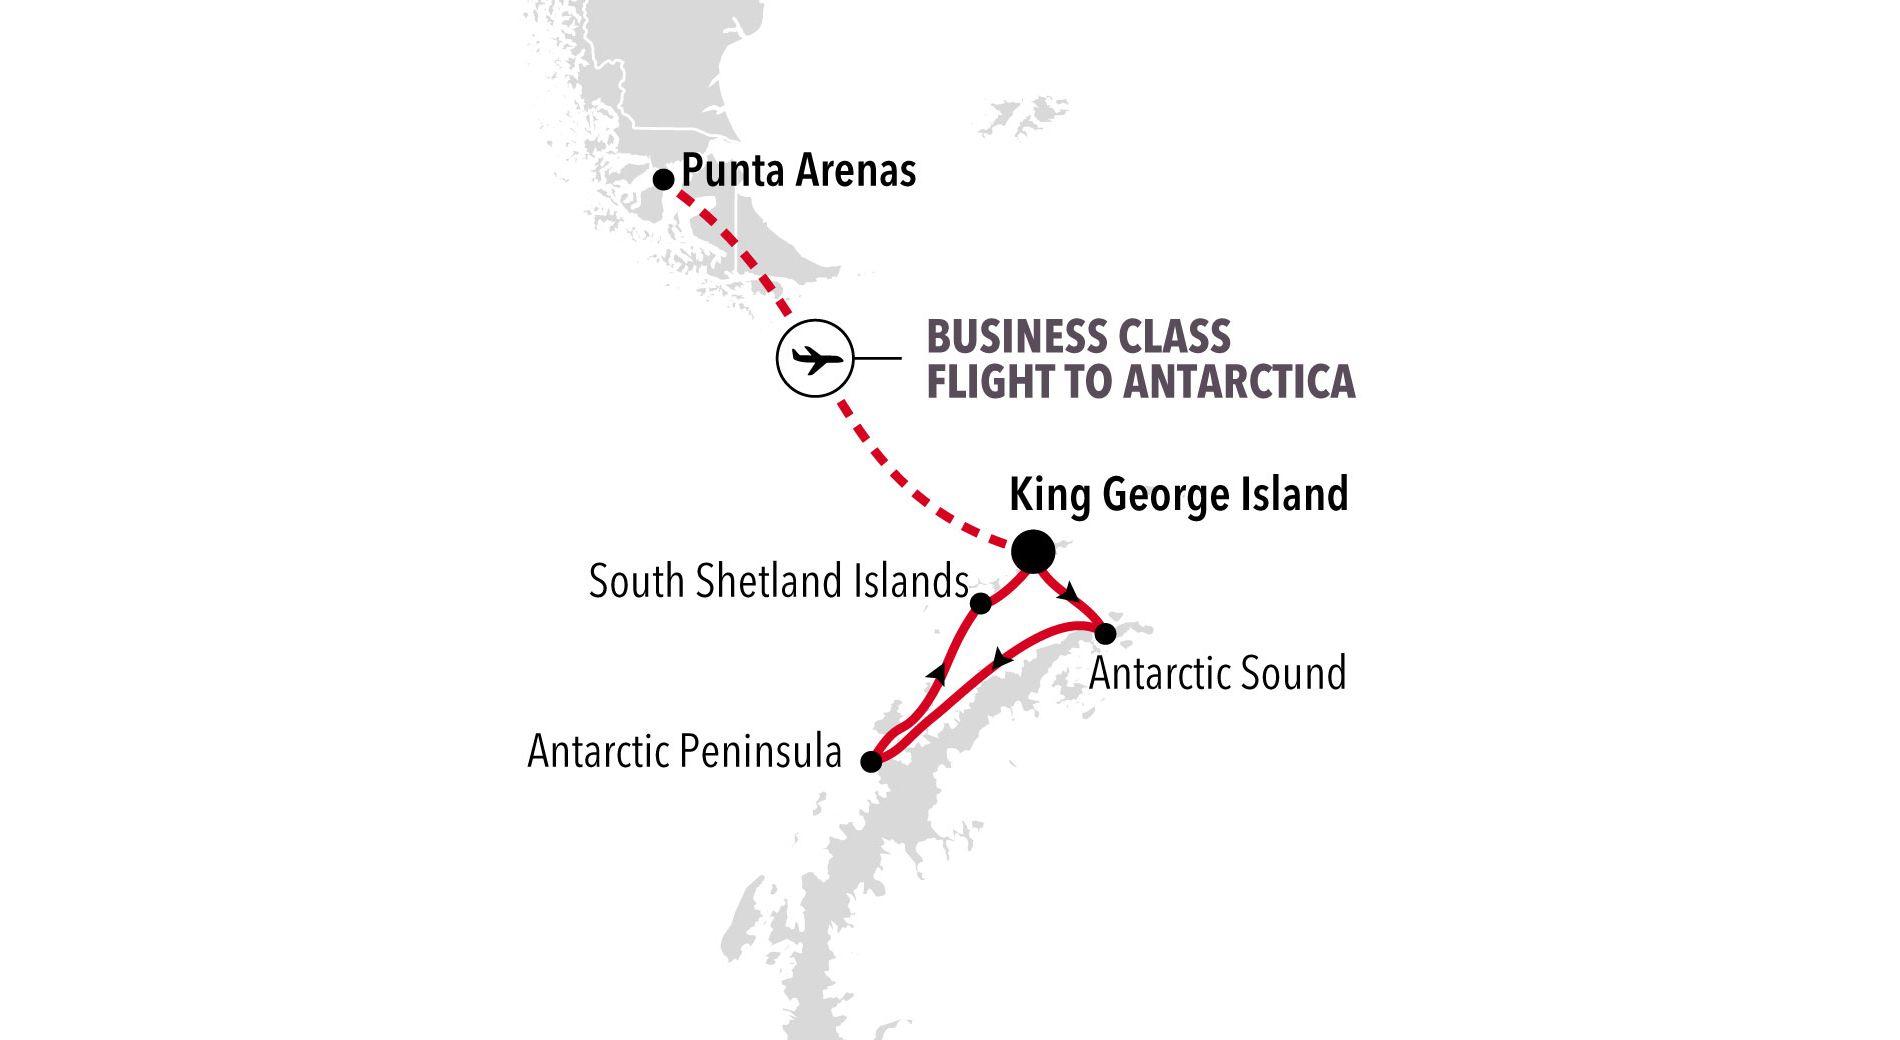 E1220118006 - King George Island to King George Island